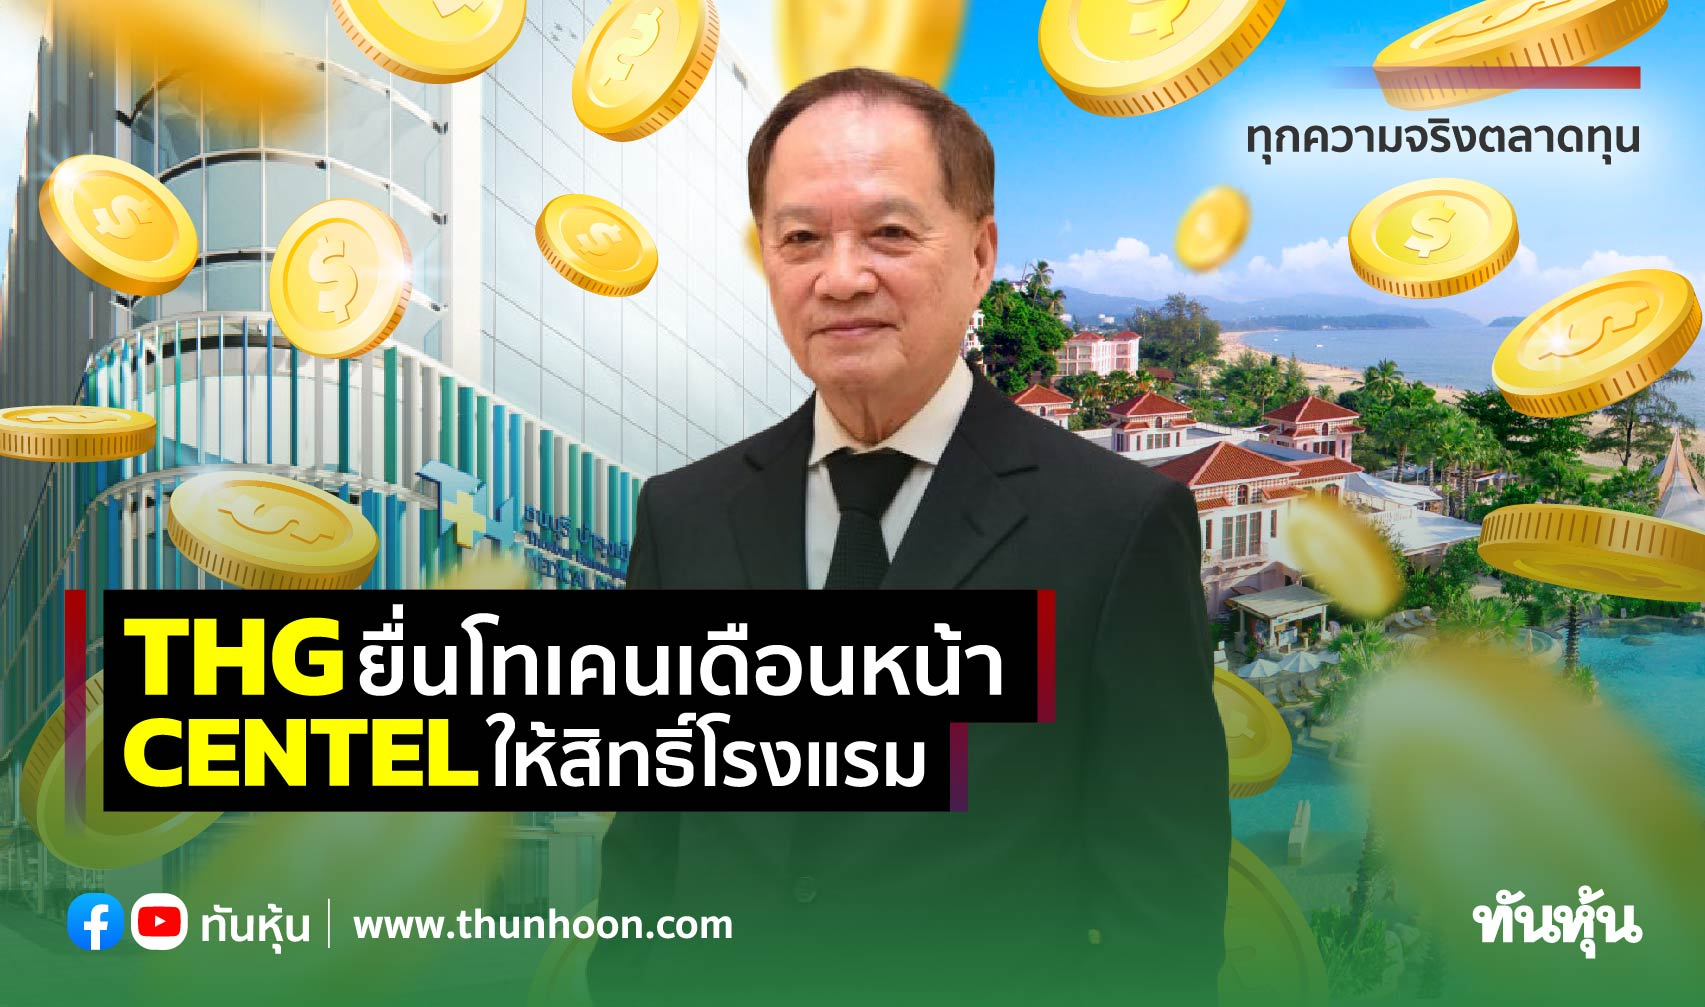 THGยื่นโทเคนเดือนหน้า CENTELให้สิทธิ์โรงแรม